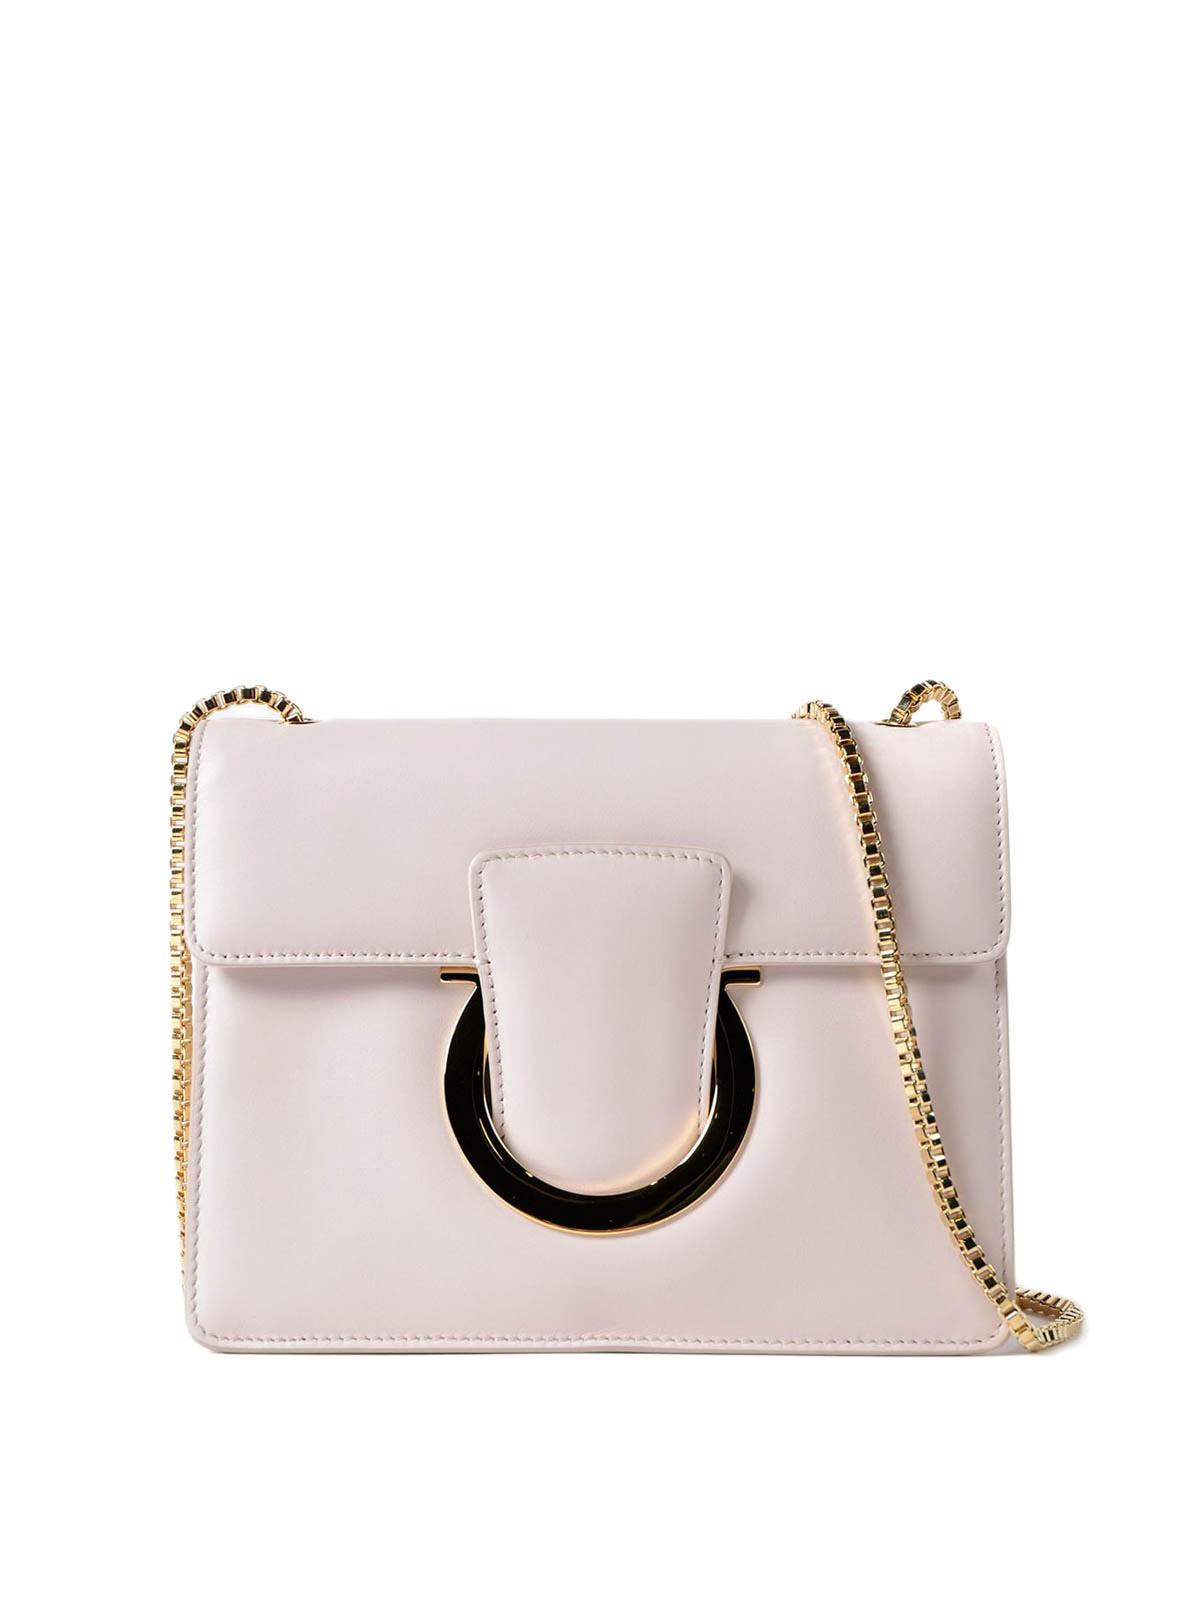 Thalia leather cross-body bag Salvatore Ferragamo z7iYk